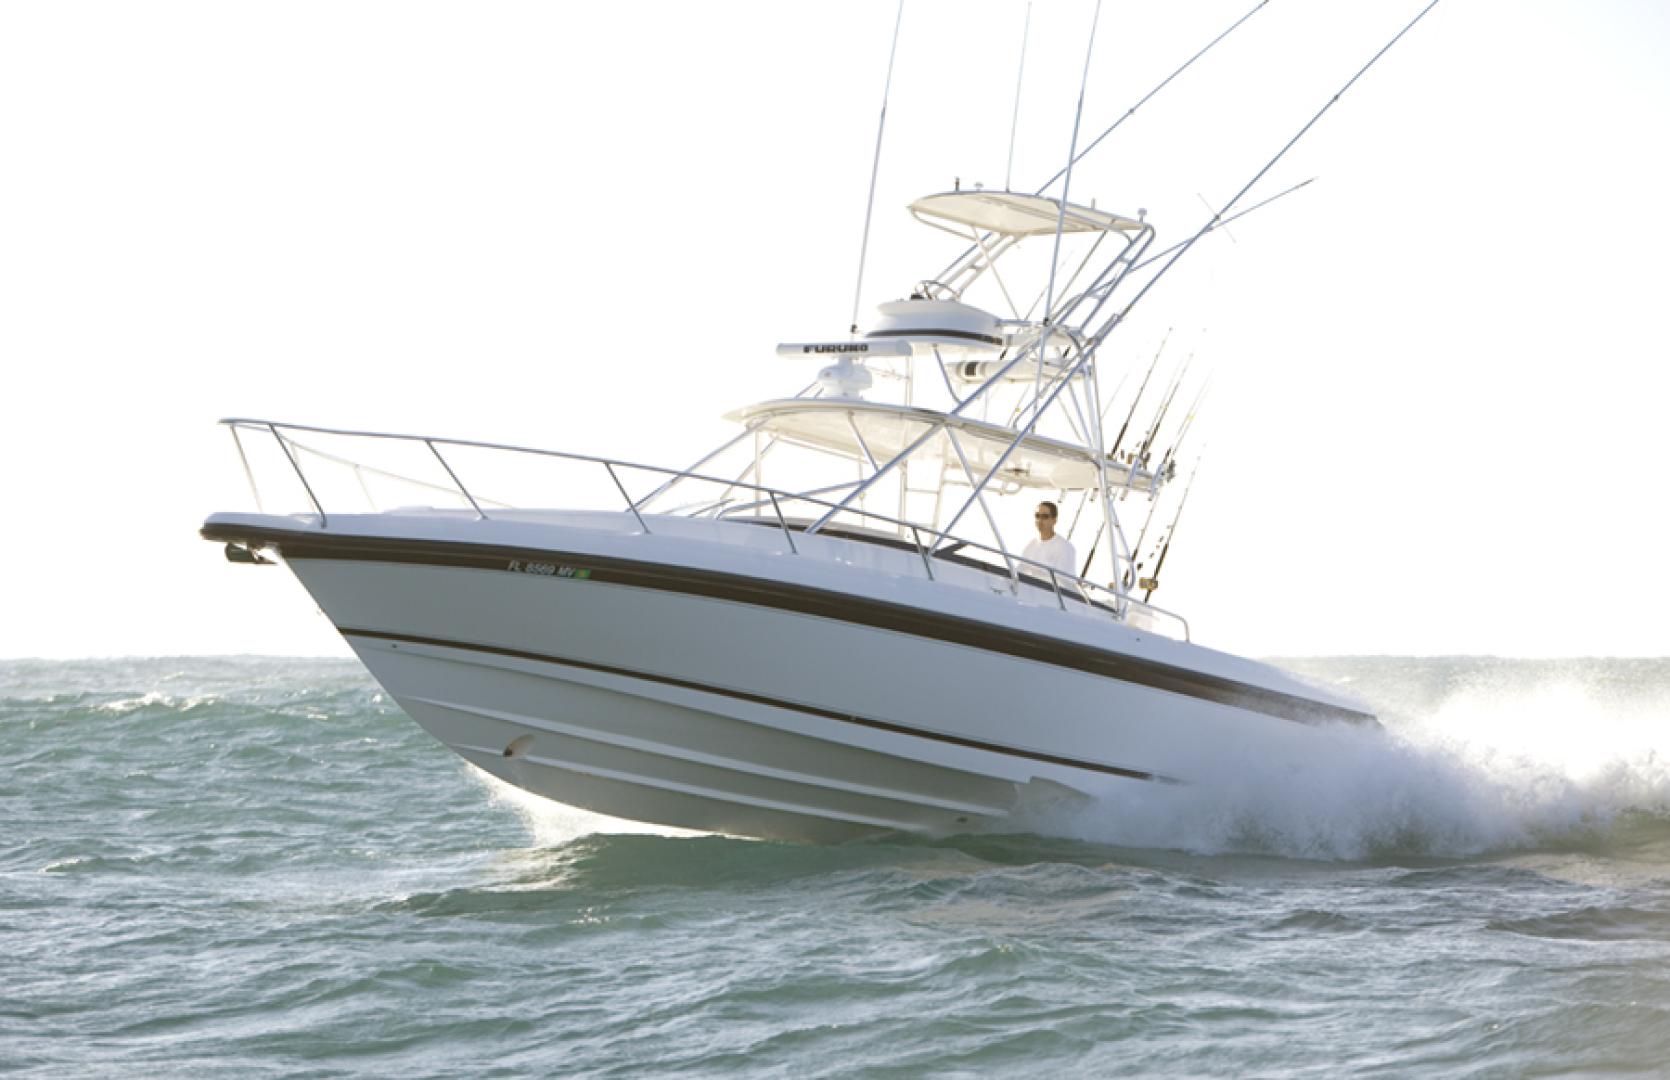 Intrepid-377 Walkaround 2005-Rock Boat REFIT 2018 Dania Beach-Florida-United States-377 Intrepid Profile-1539583 | Thumbnail